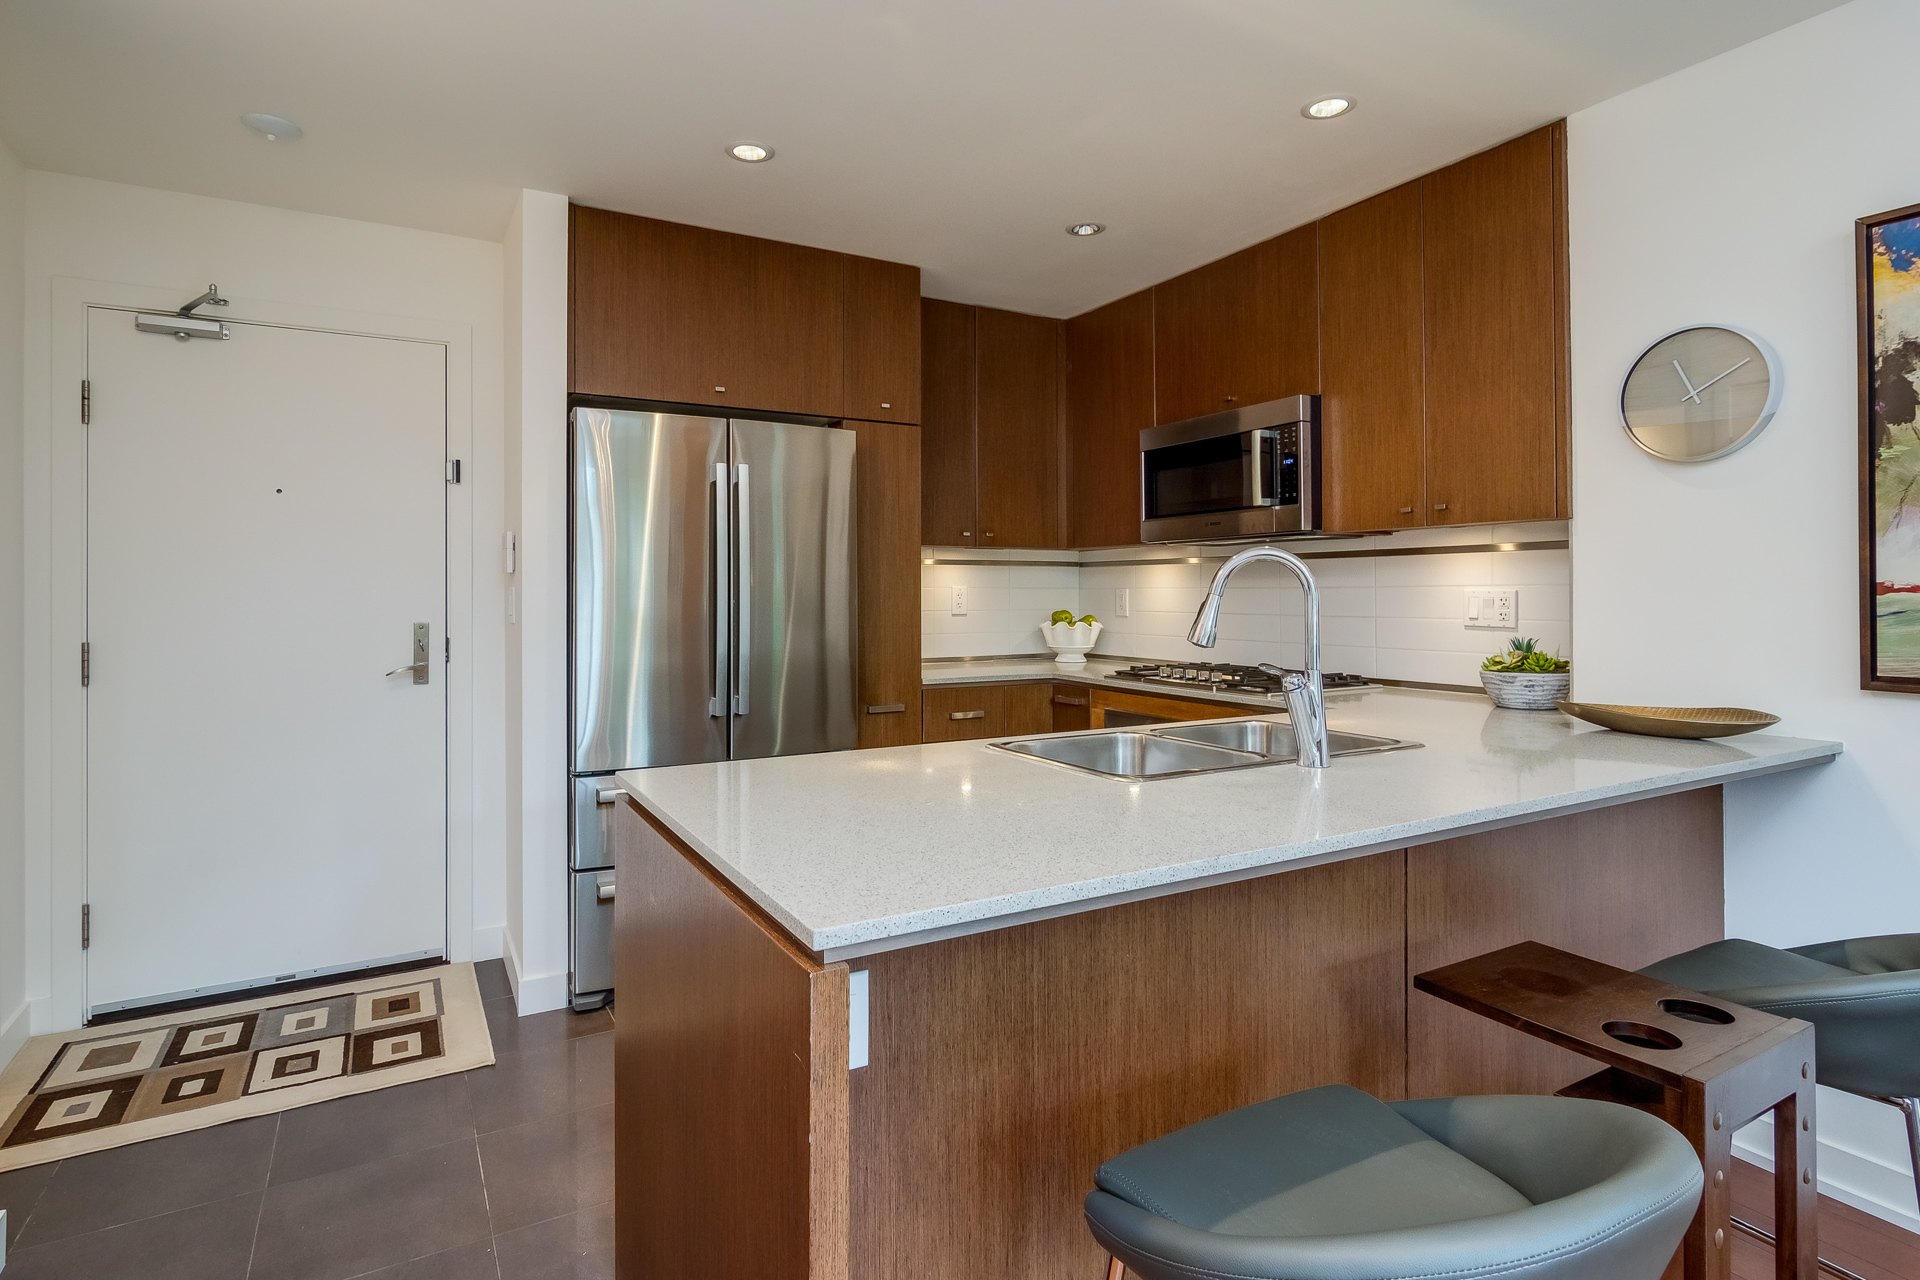 Kitchen at 151 - 2950 King George Boulevard, King George Corridor, South Surrey White Rock